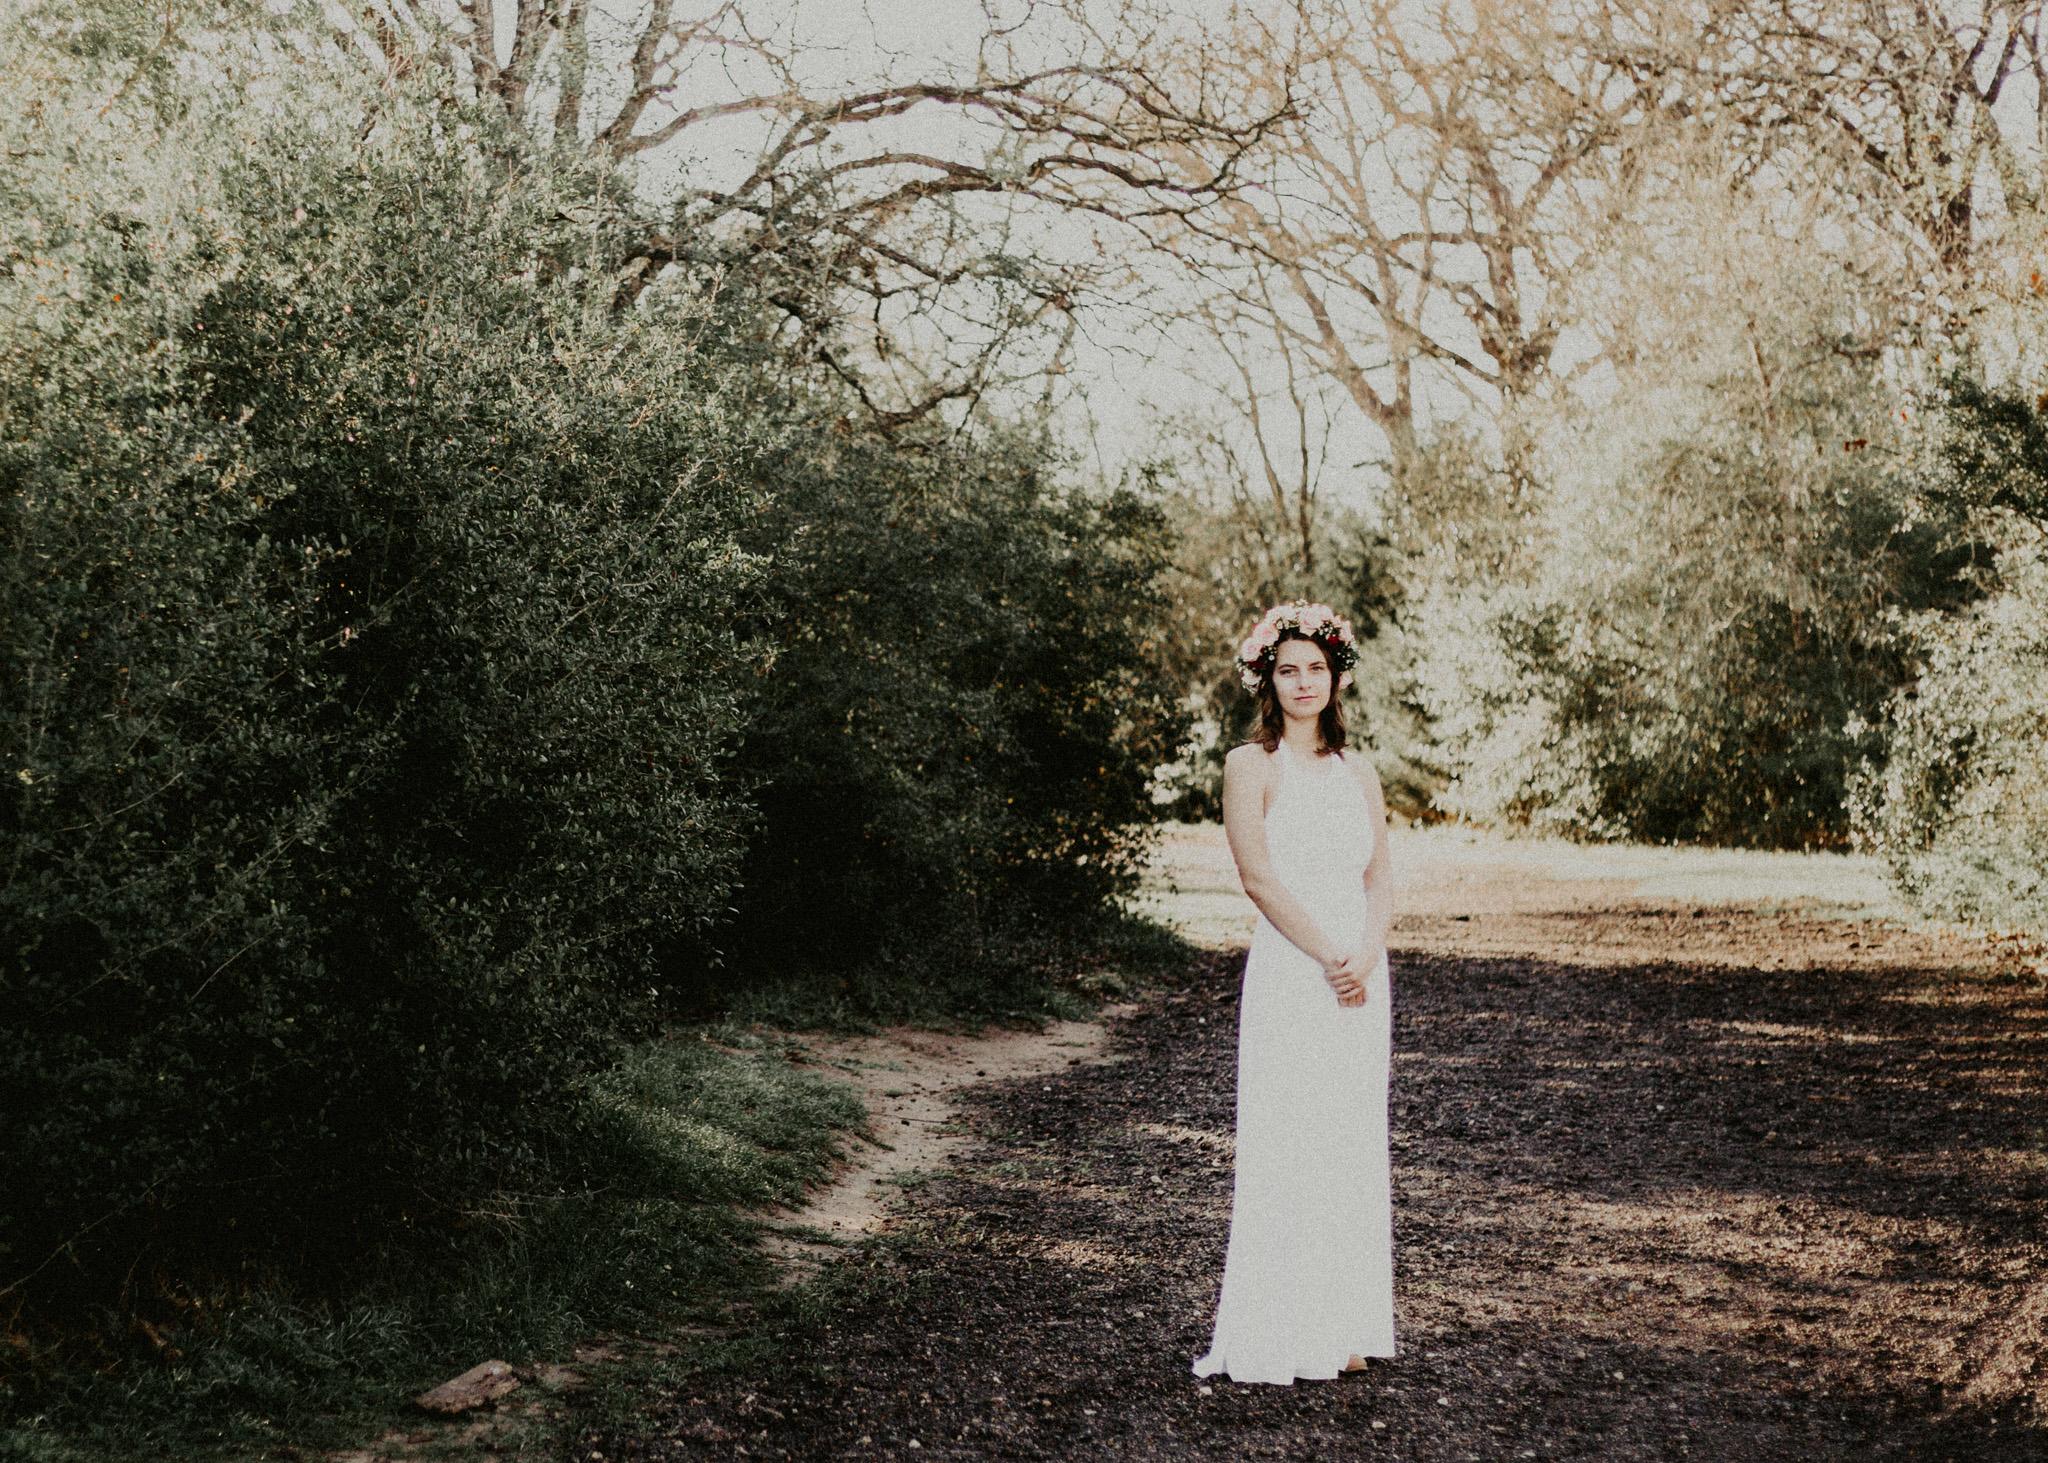 zoe bridals-5.jpg